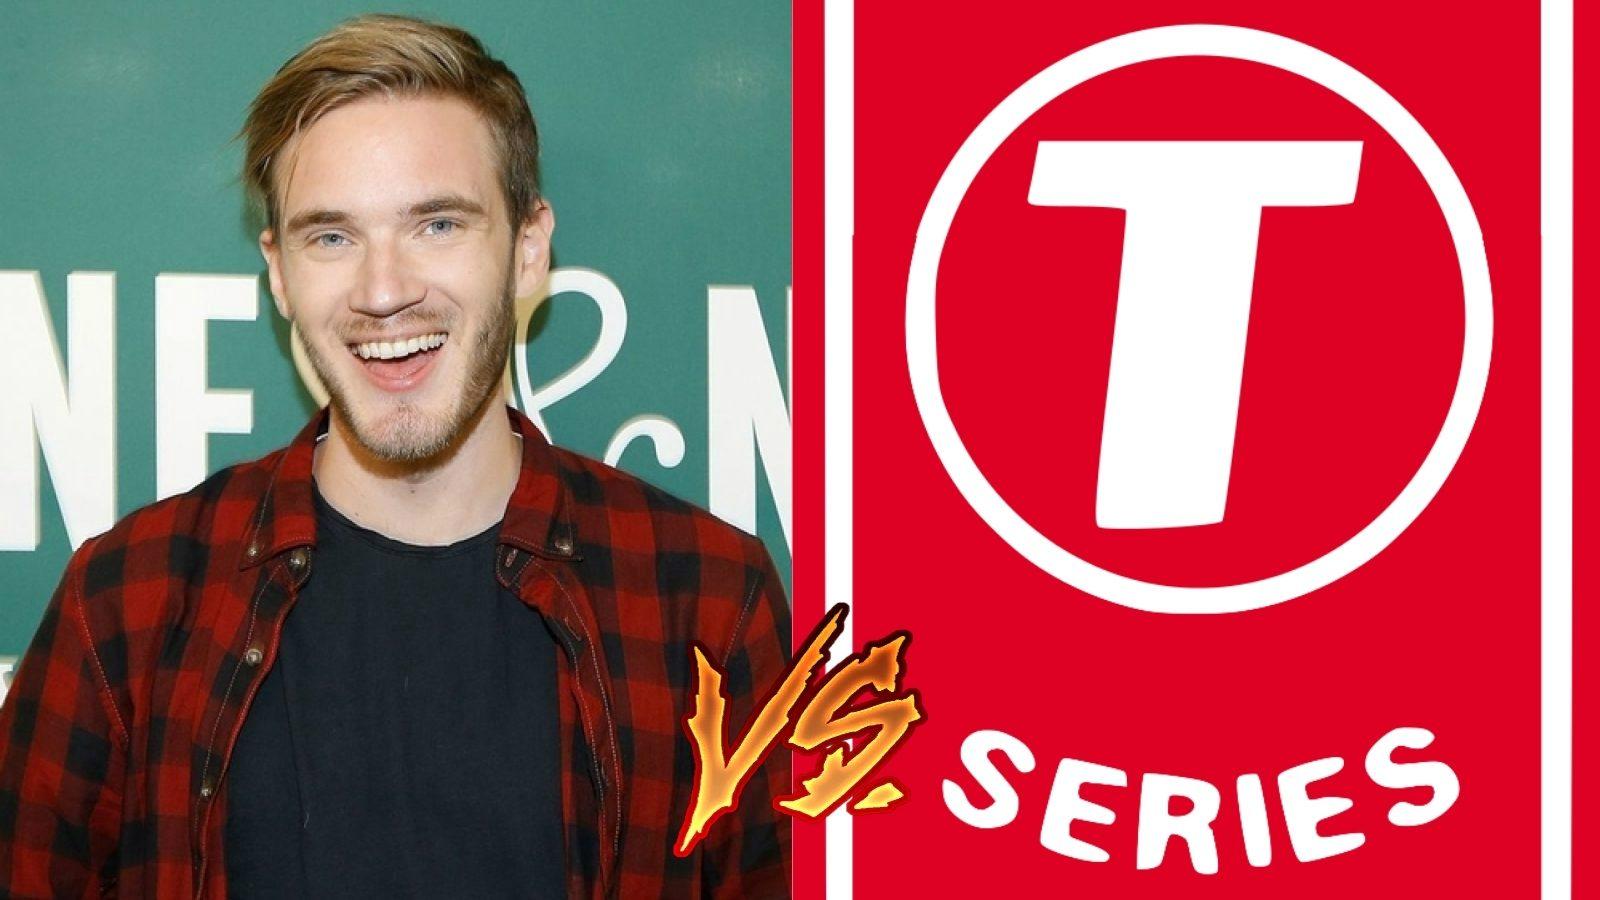 PewDiePie and T-Series